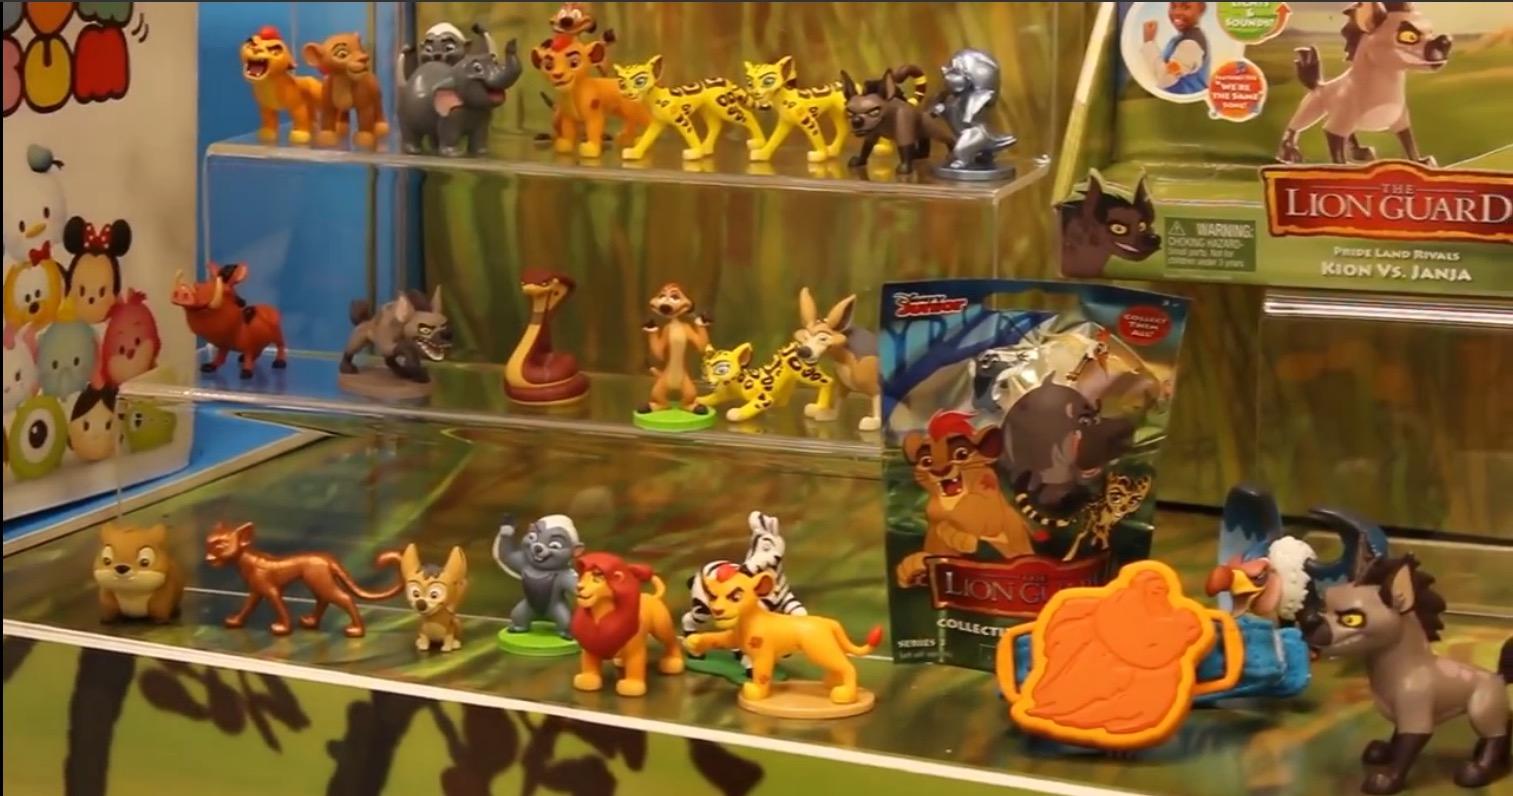 Lion Guard Toy Fair 2016 2 By Se7j R On Deviantart